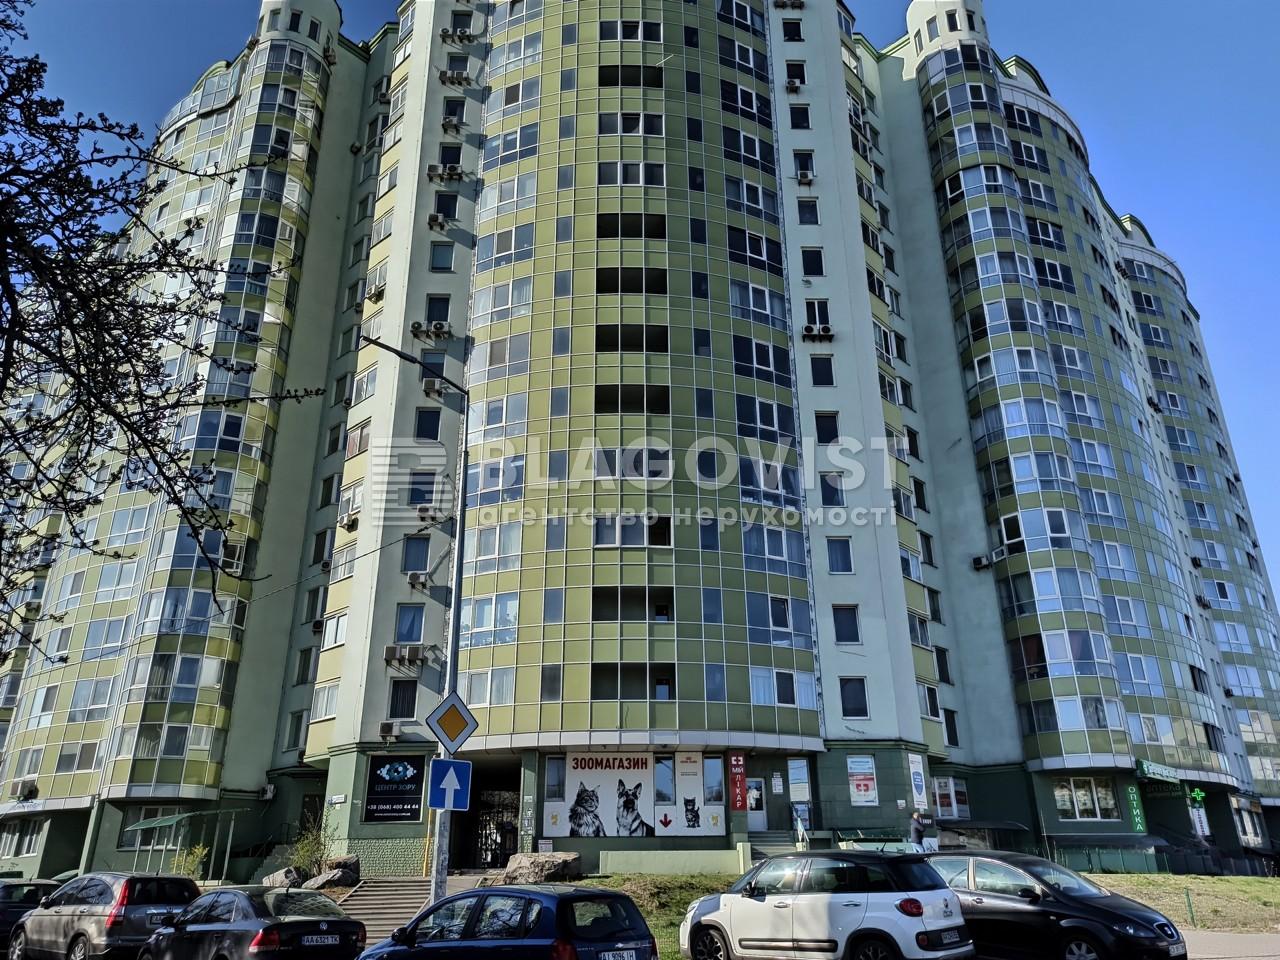 Квартира M-38961, Коломыйский пер., 17/31а, Киев - Фото 9